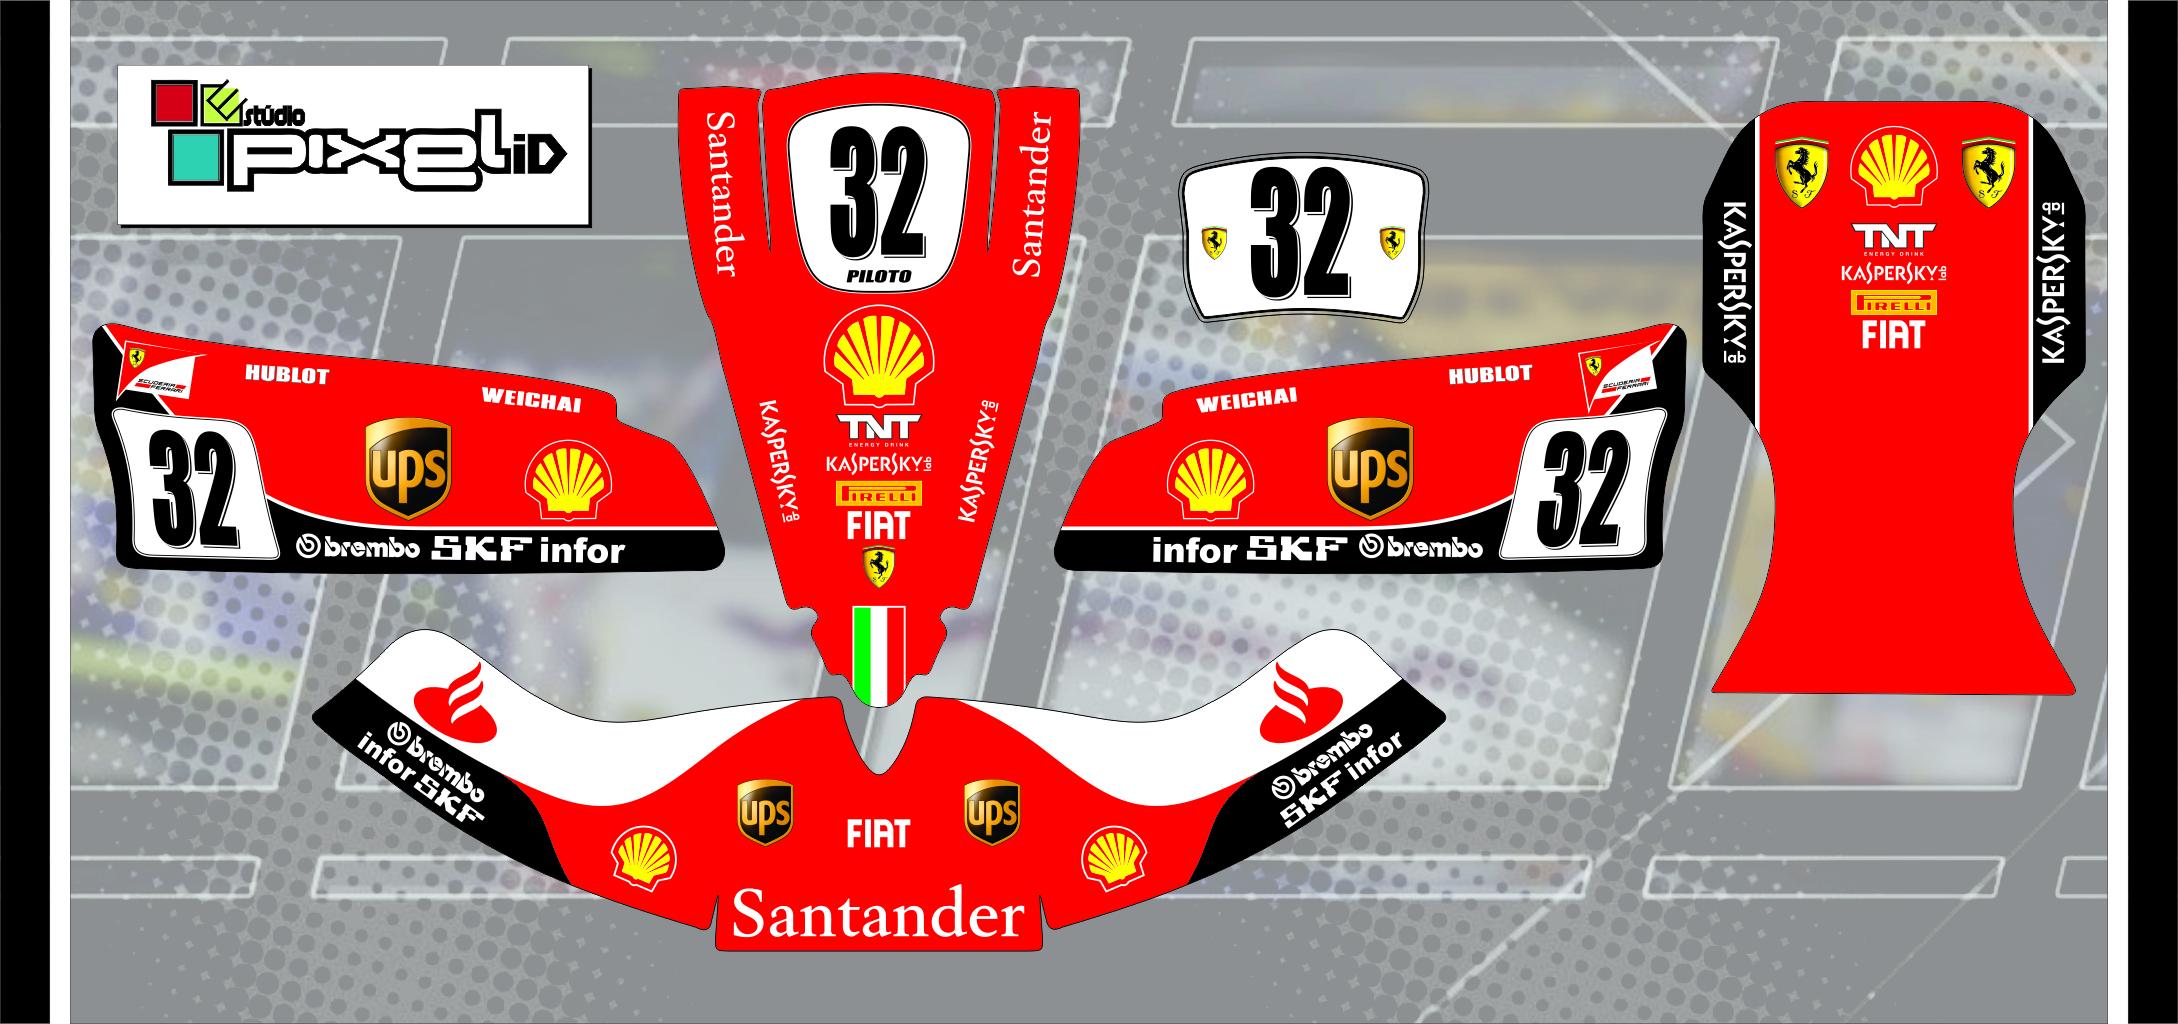 Artesanato Fortaleza ~ Adesivos Kart Réplica Ferrari F1 Adesivos para Kart Estúdio Pixel iD